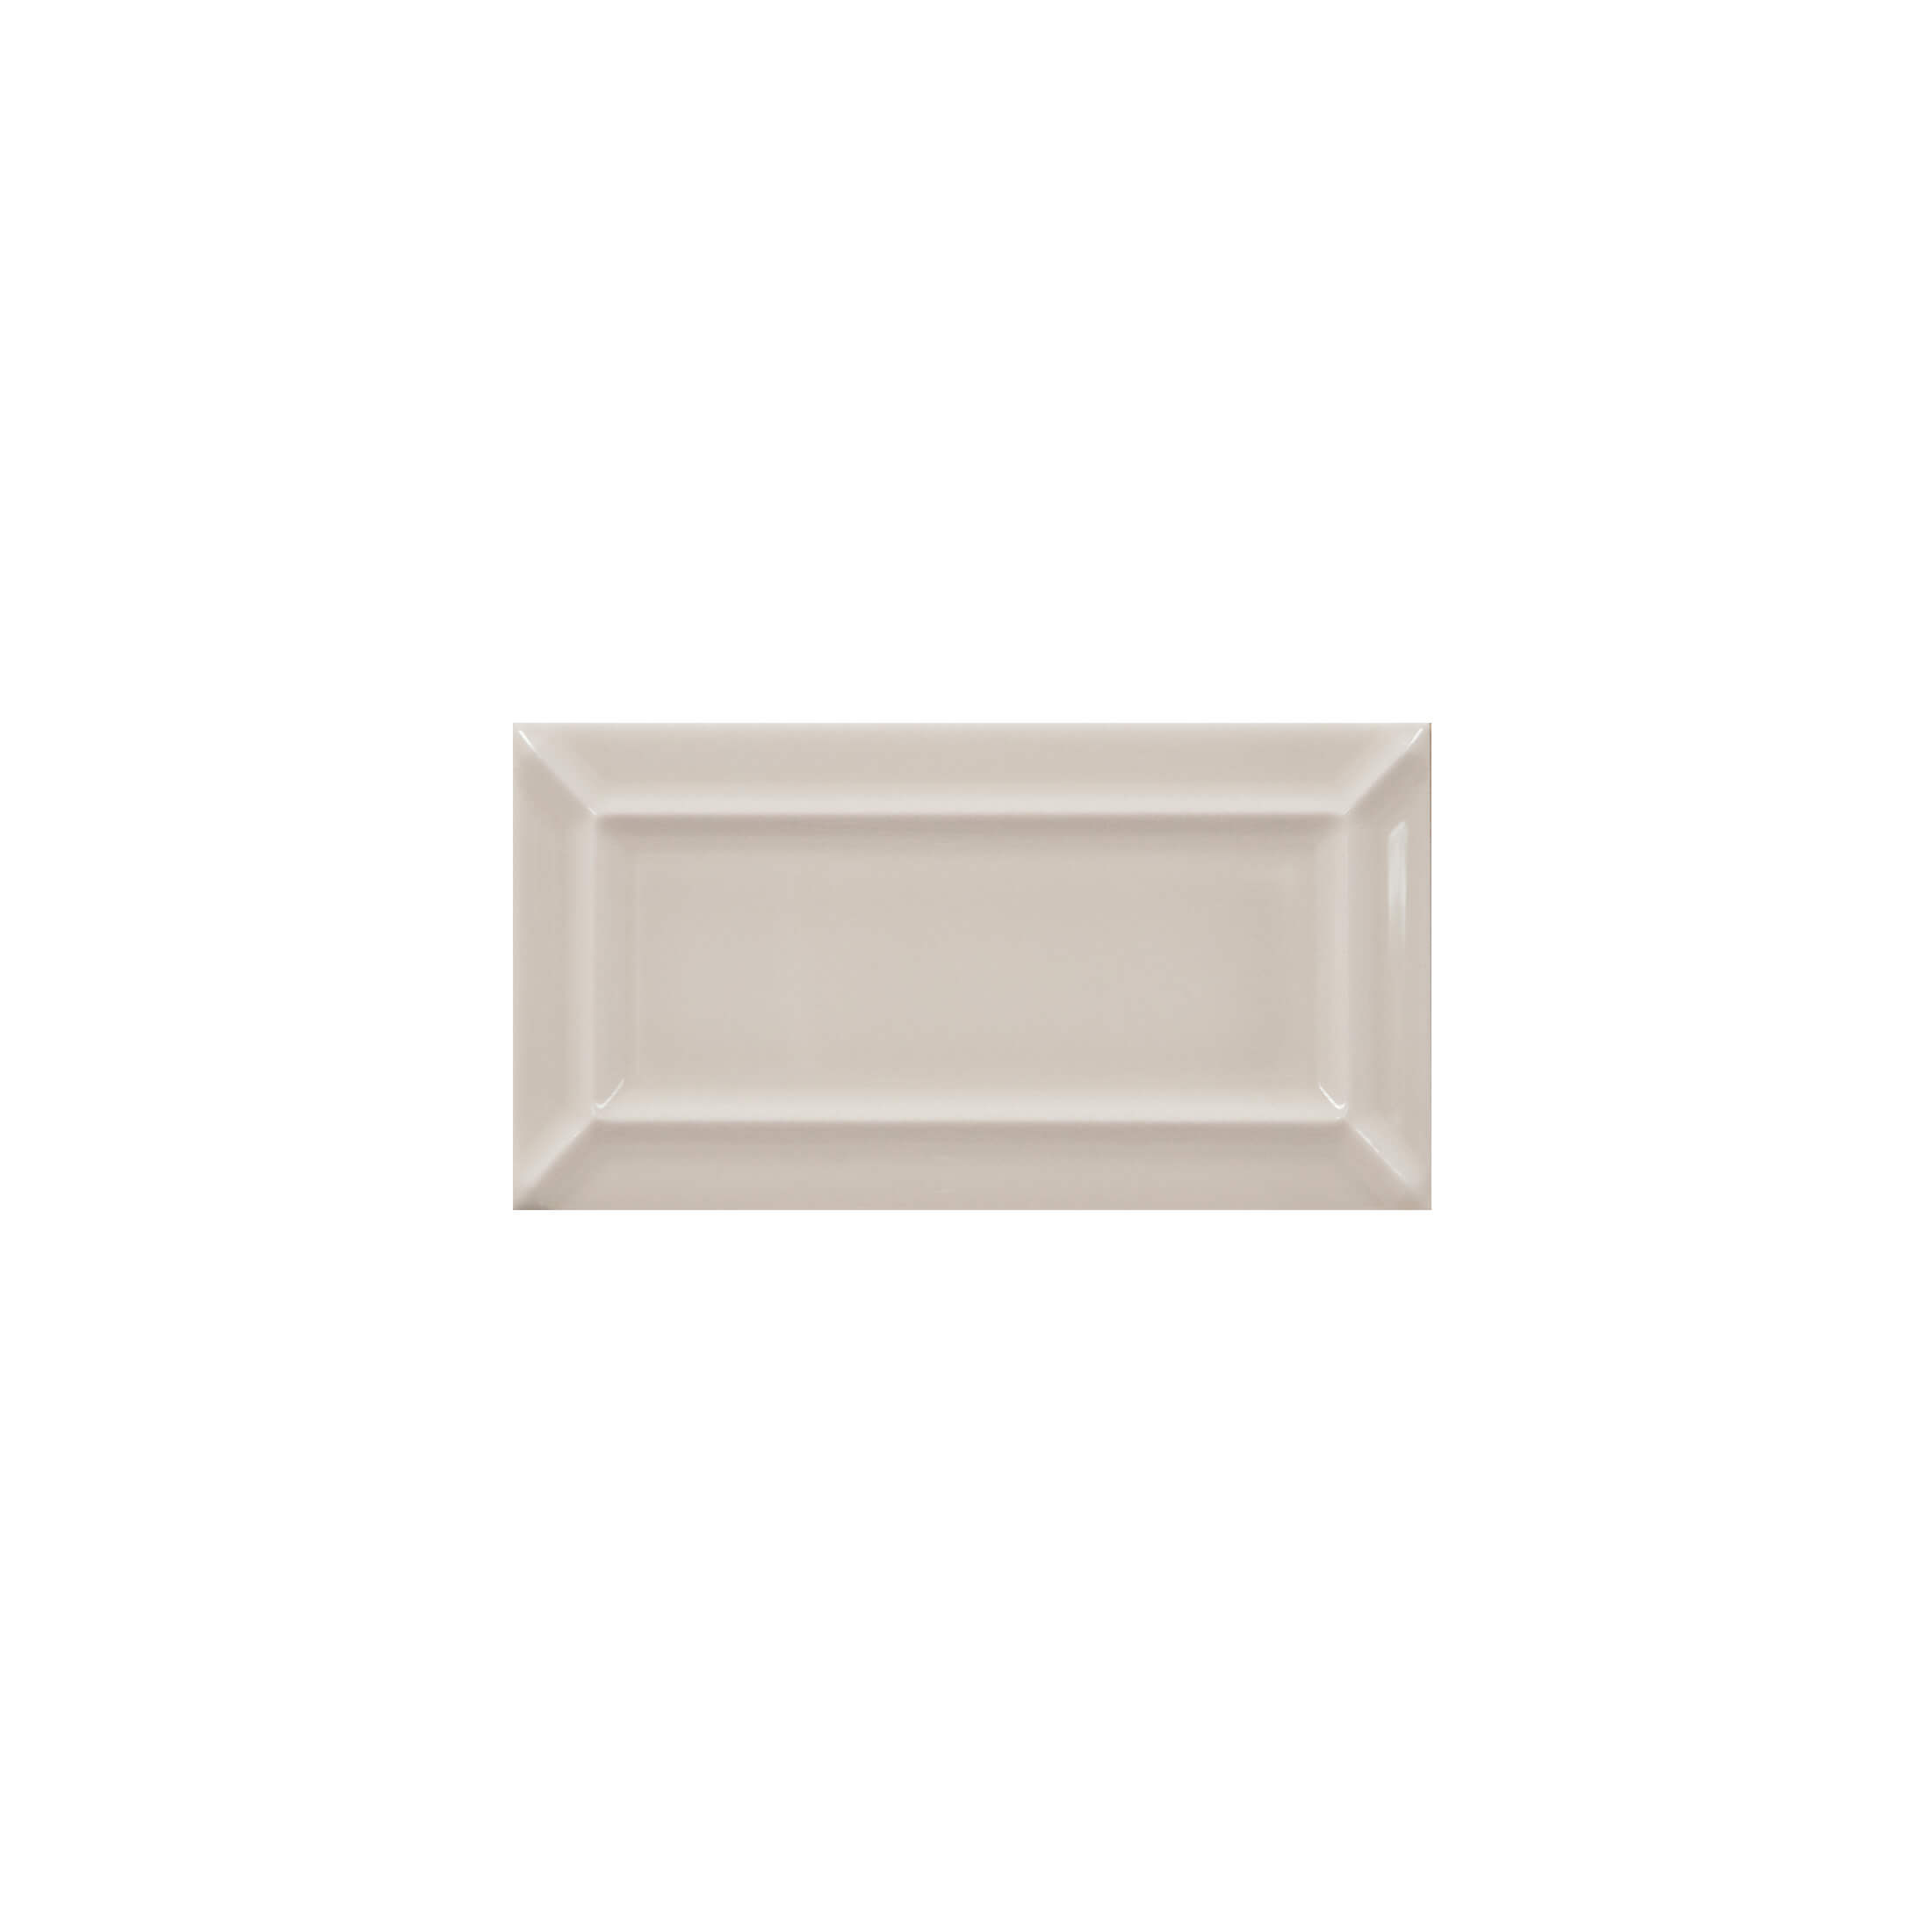 ADNE1105 - LISO EDGE - 7.5 cm X 15 cm